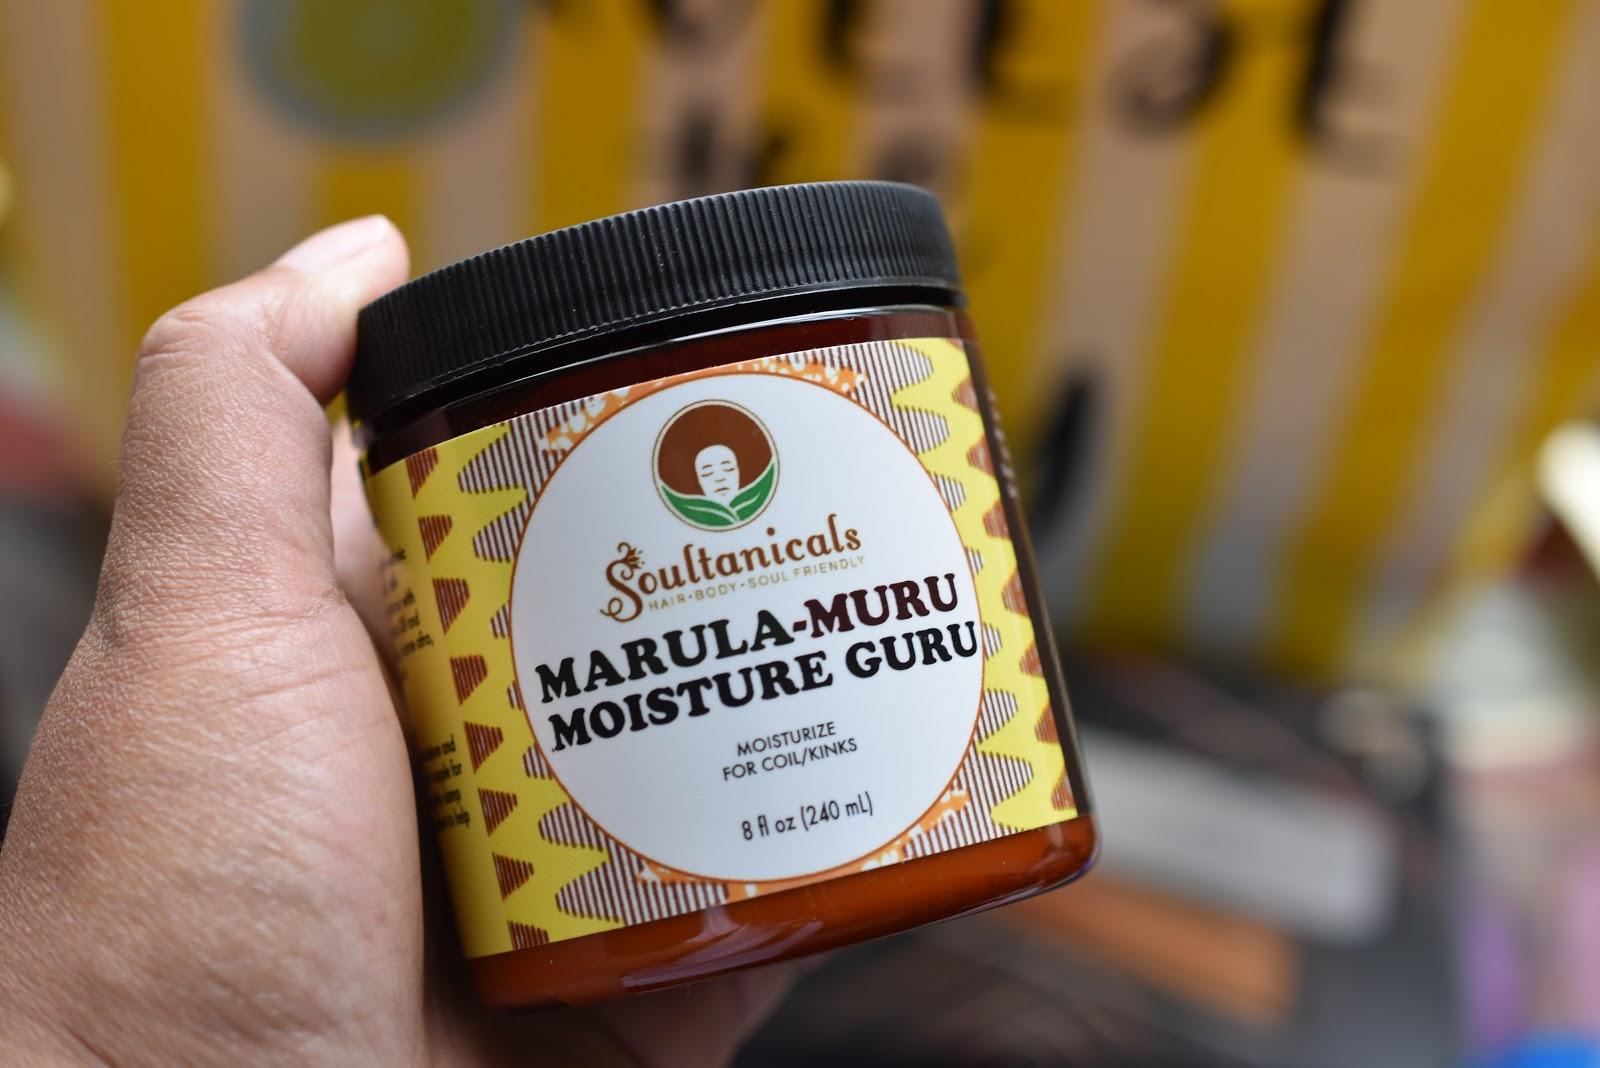 Soultanicals Marula-Muru Moisture Guru